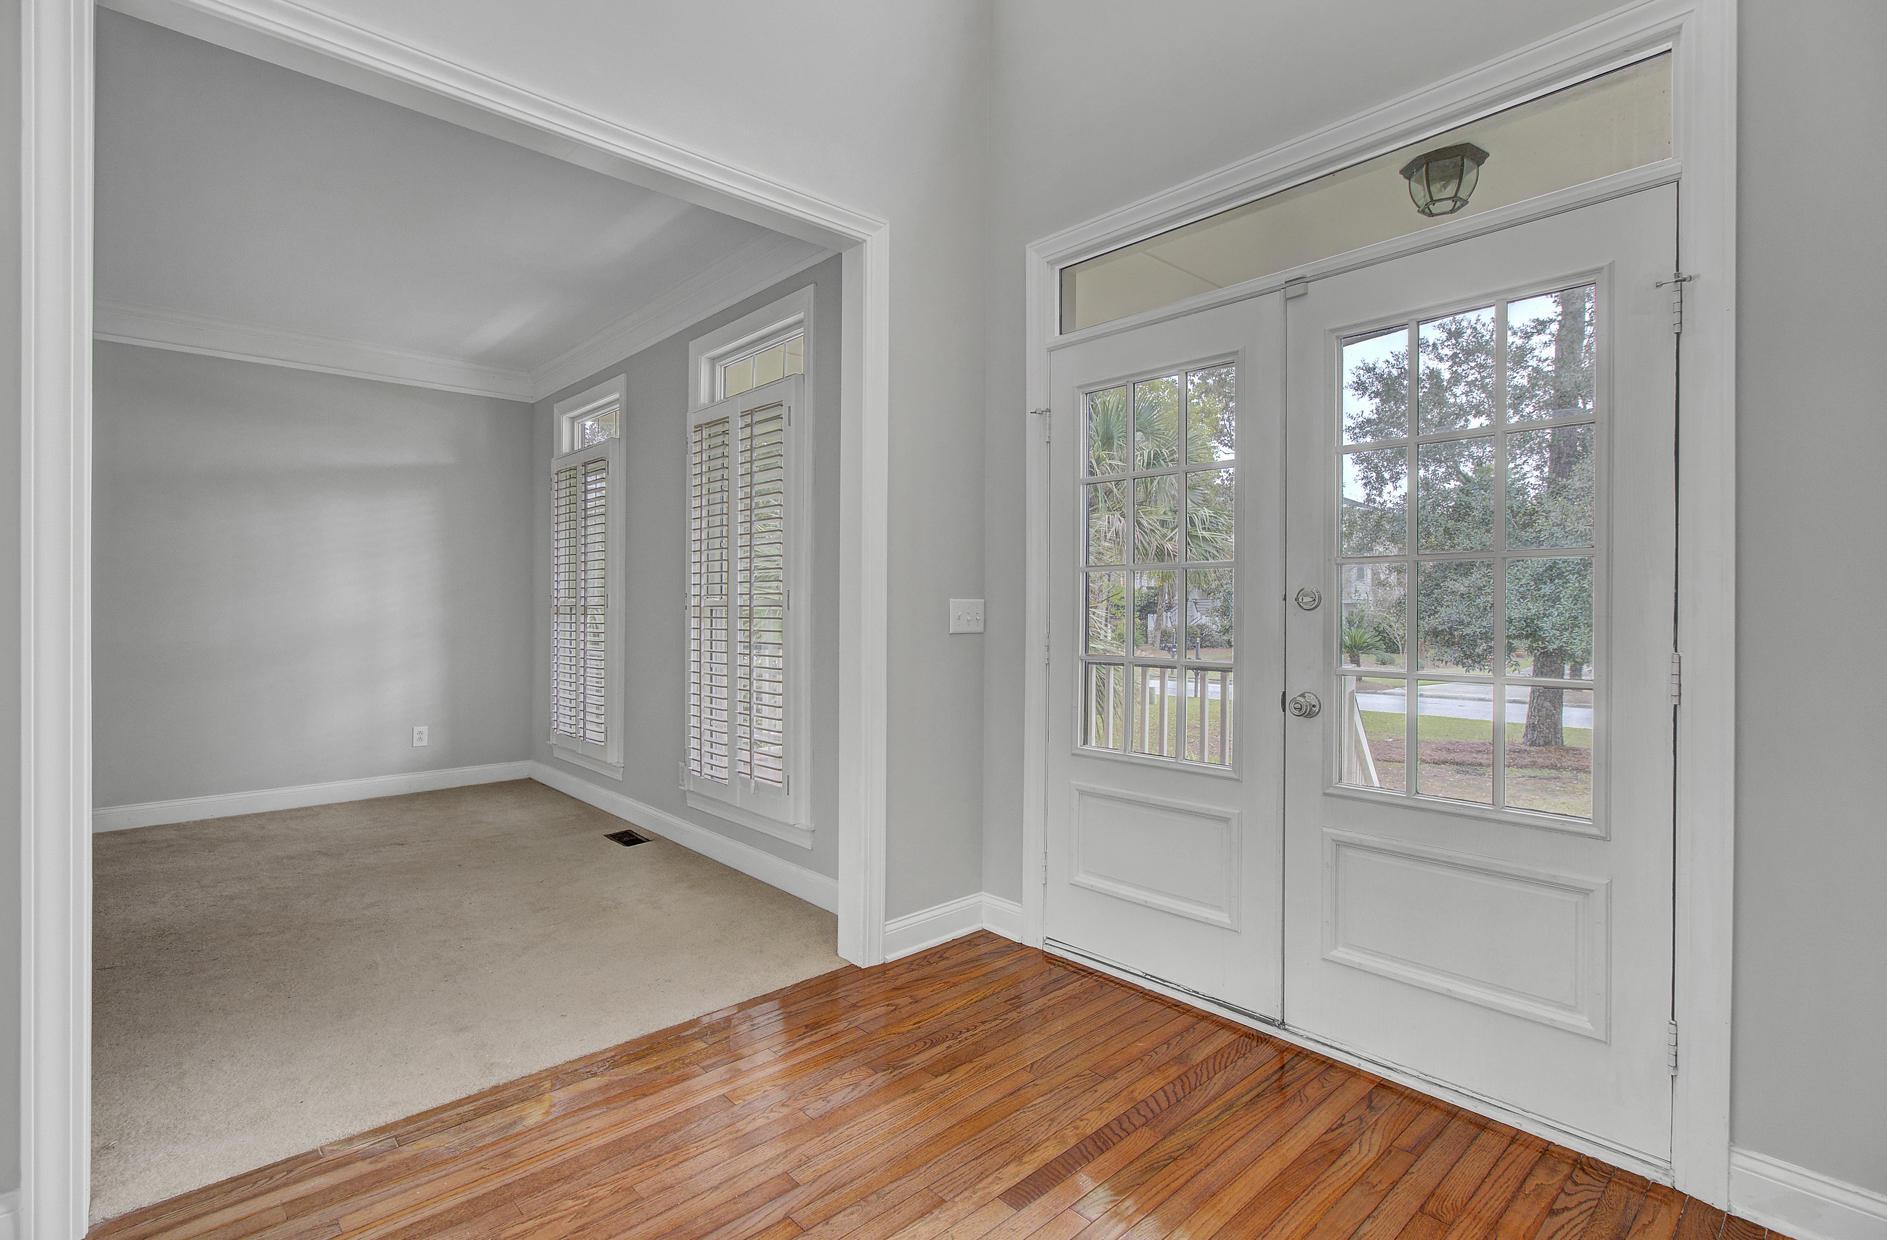 Dunes West Homes For Sale - 2321 Darts Cove, Mount Pleasant, SC - 3